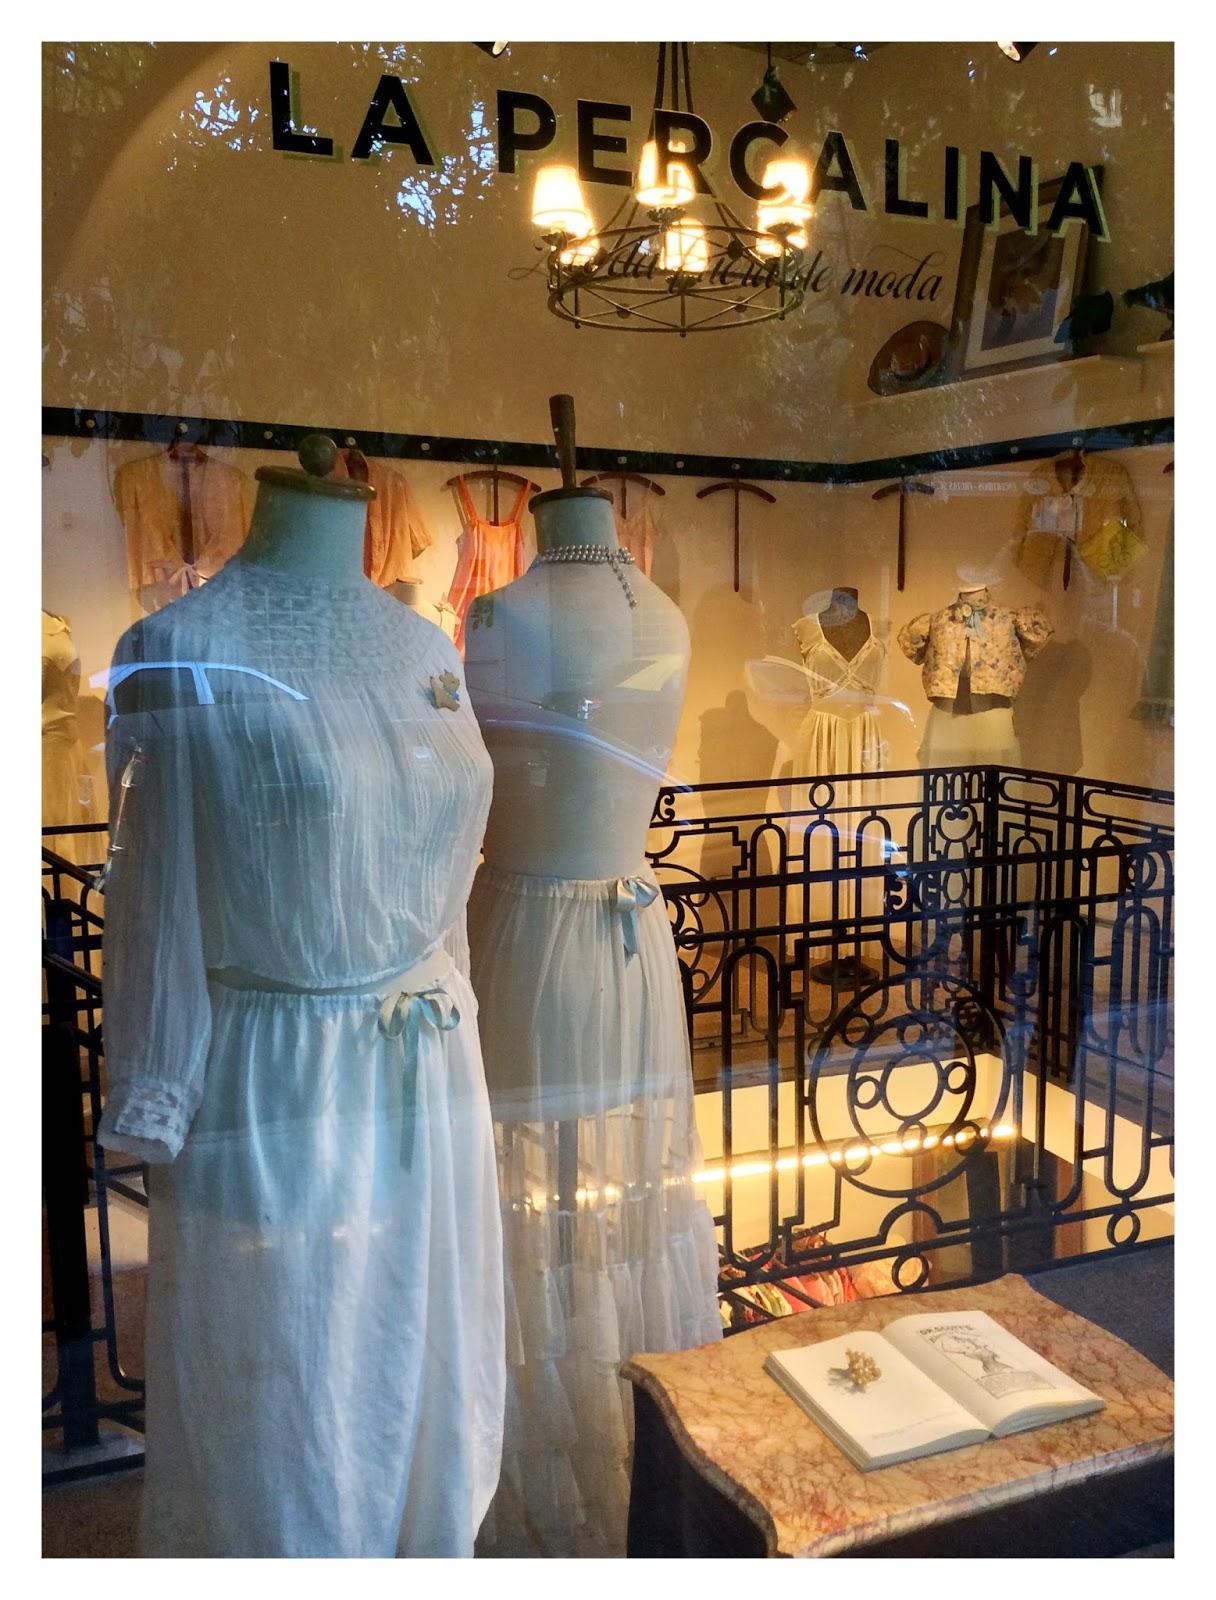 La percalina moda fuera de moda ups nos quedamos - Modelos de vidrieras ...